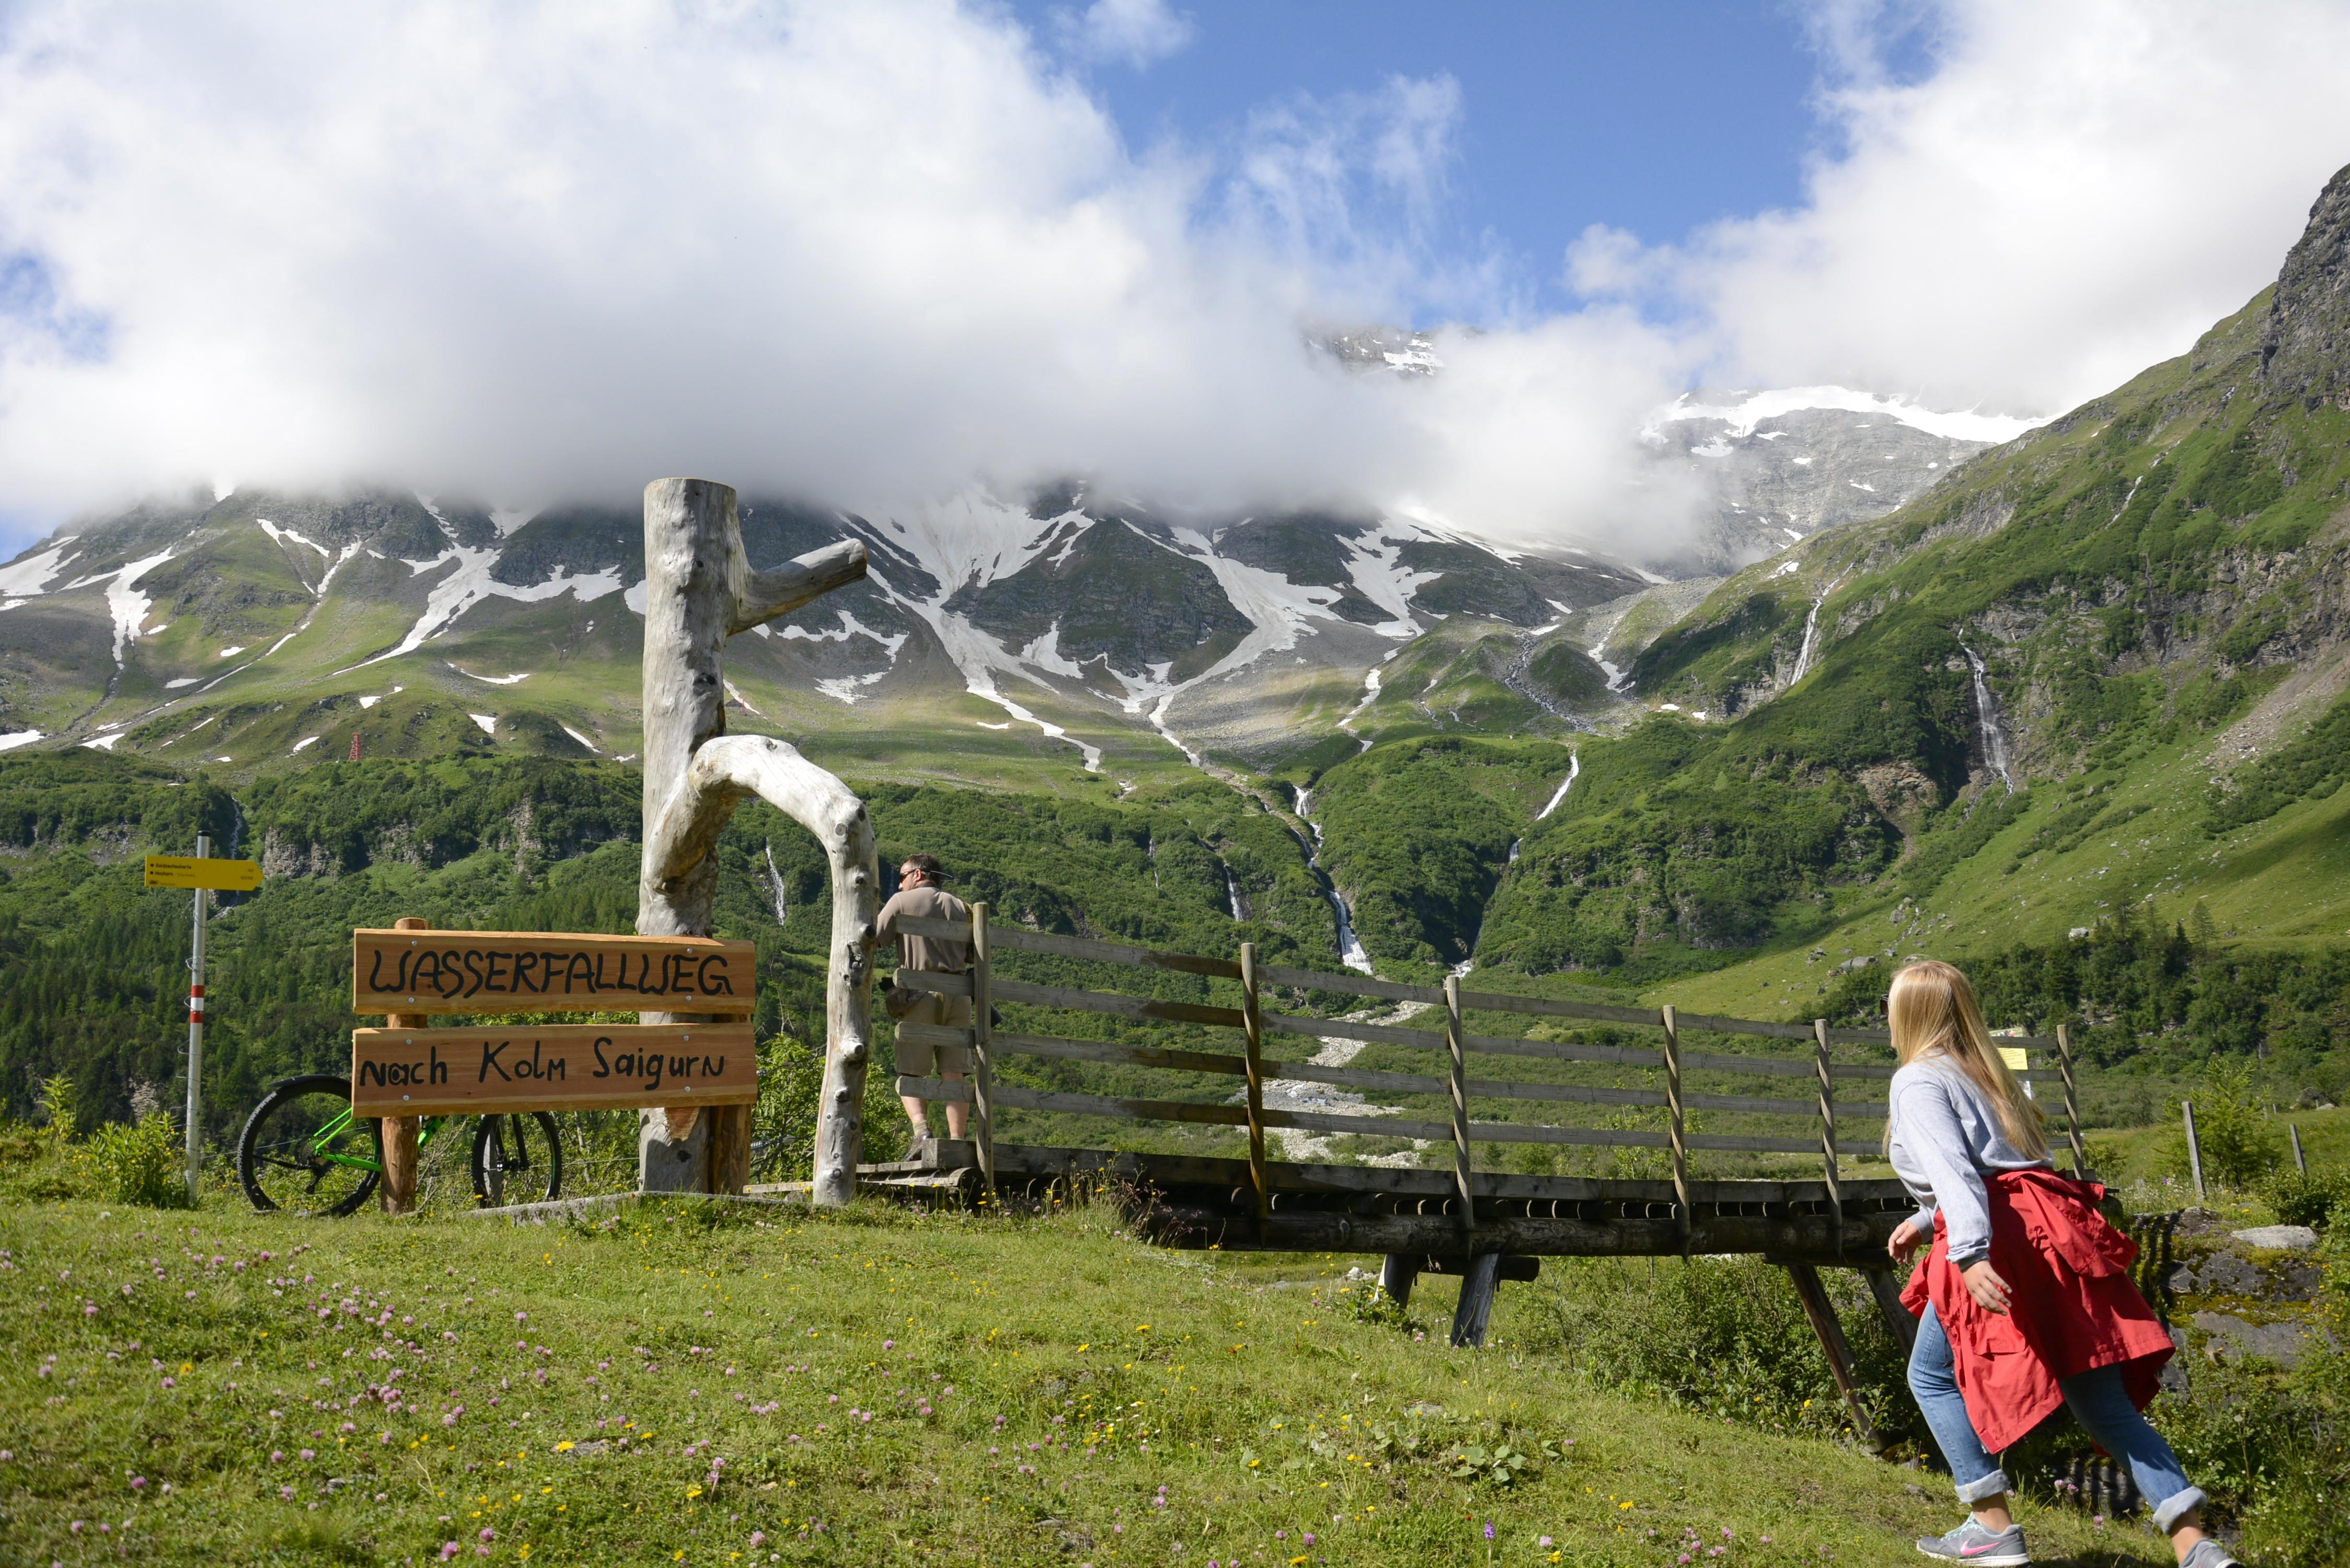 climbing in austrian mountains